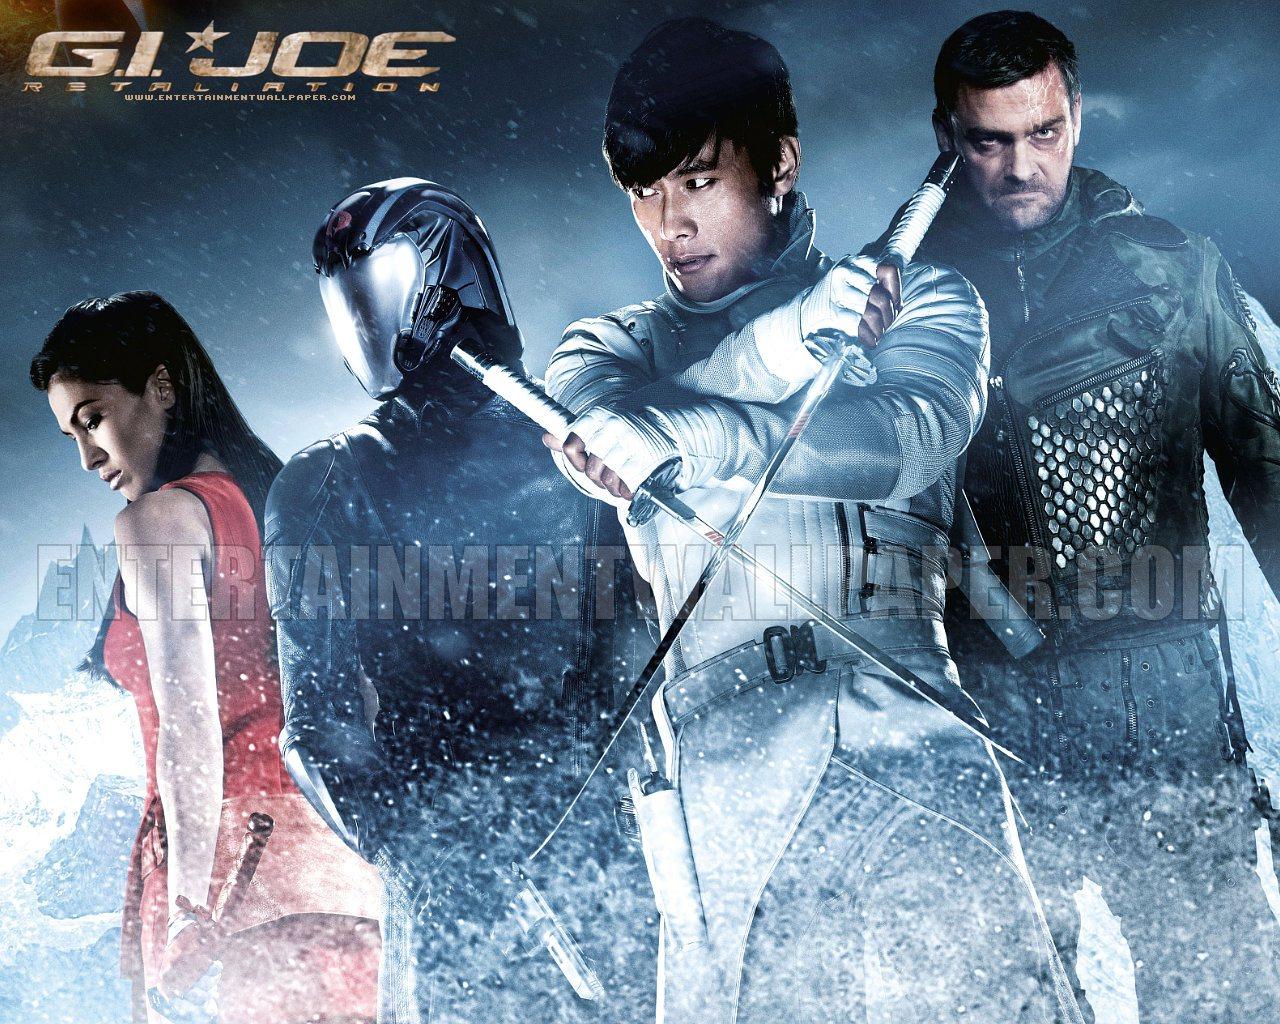 G I Joe Retaliation 2013 Film Yang Akan Datang Wallpaper 34093233 Fanpop